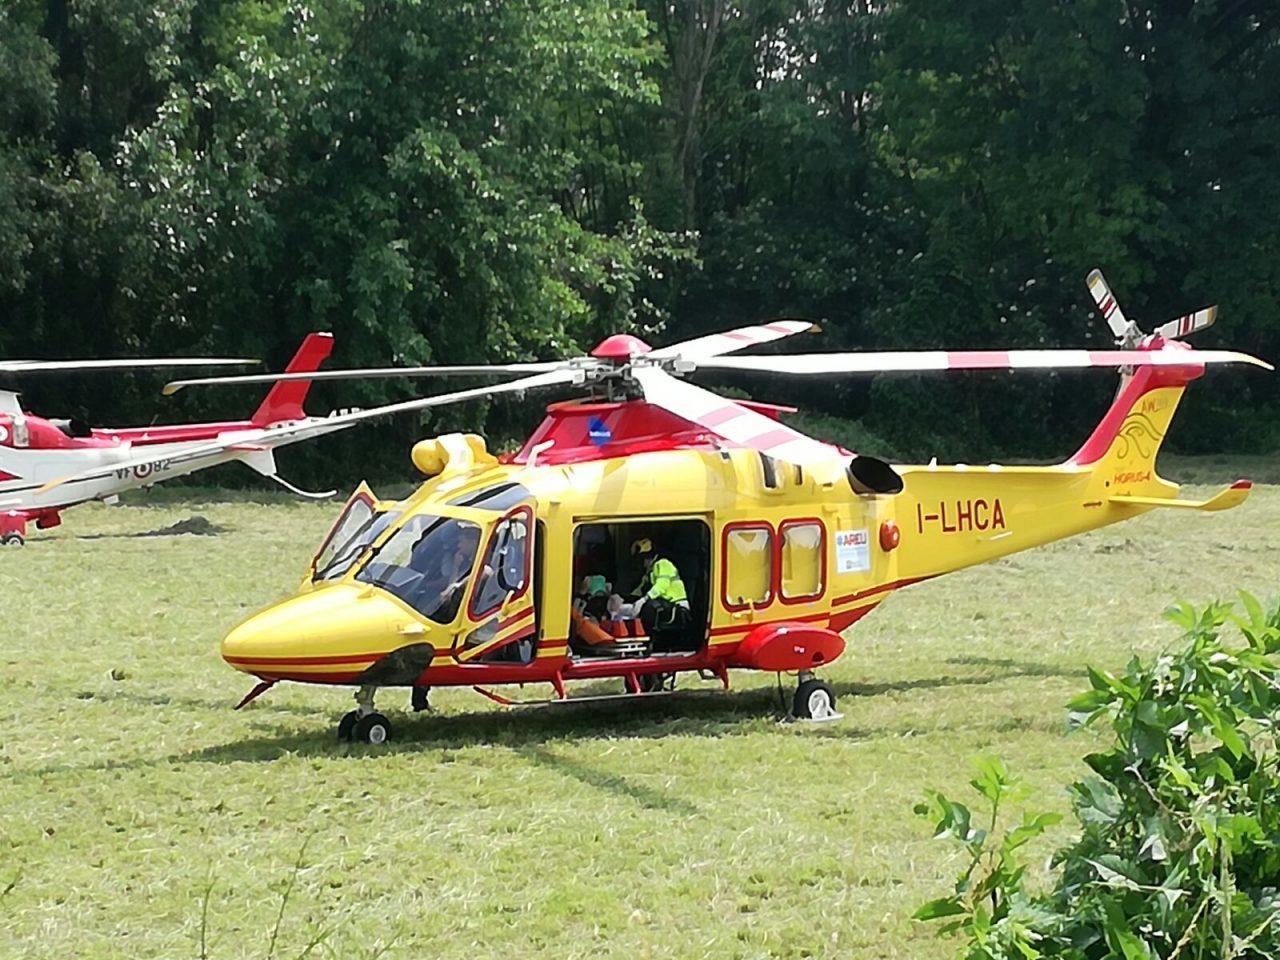 incidente elisoccorso elicottero ambulanza adda